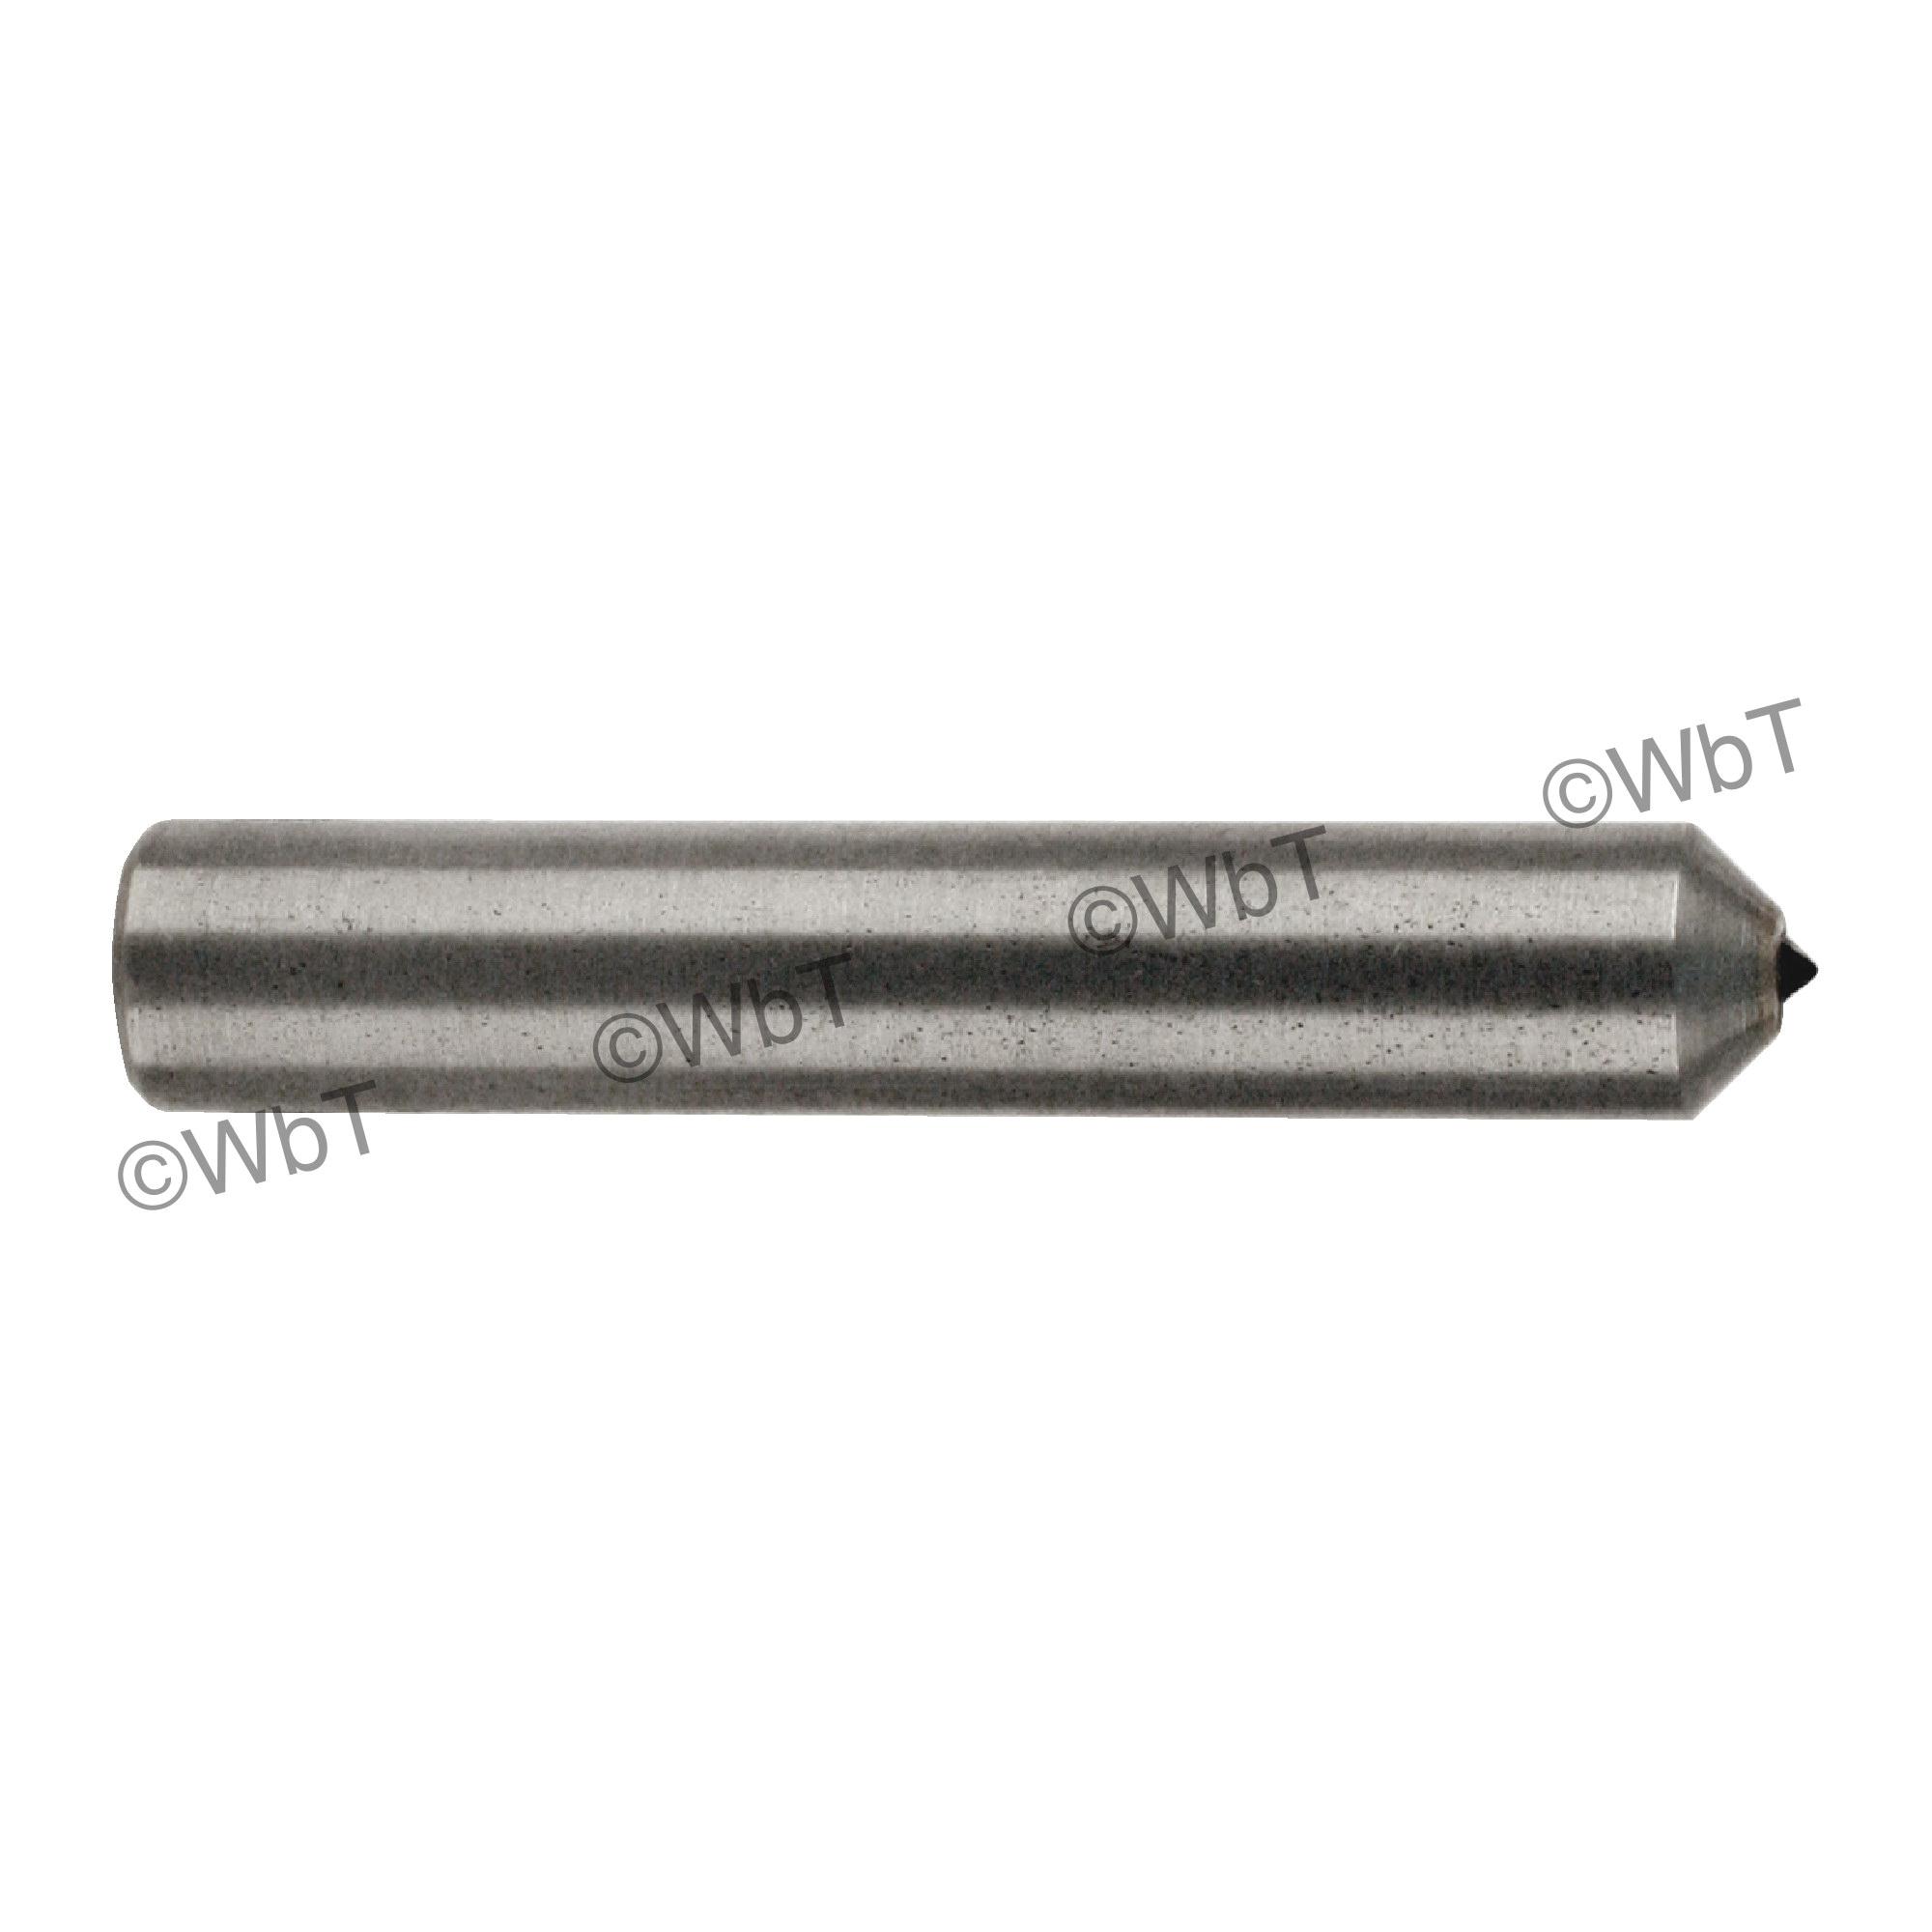 TTC 53-811-260 1-Stone Radius Sliver Set Diamond Dressing Tool, Single Point, 3/8 in Dia Shank, 3 in L Shank